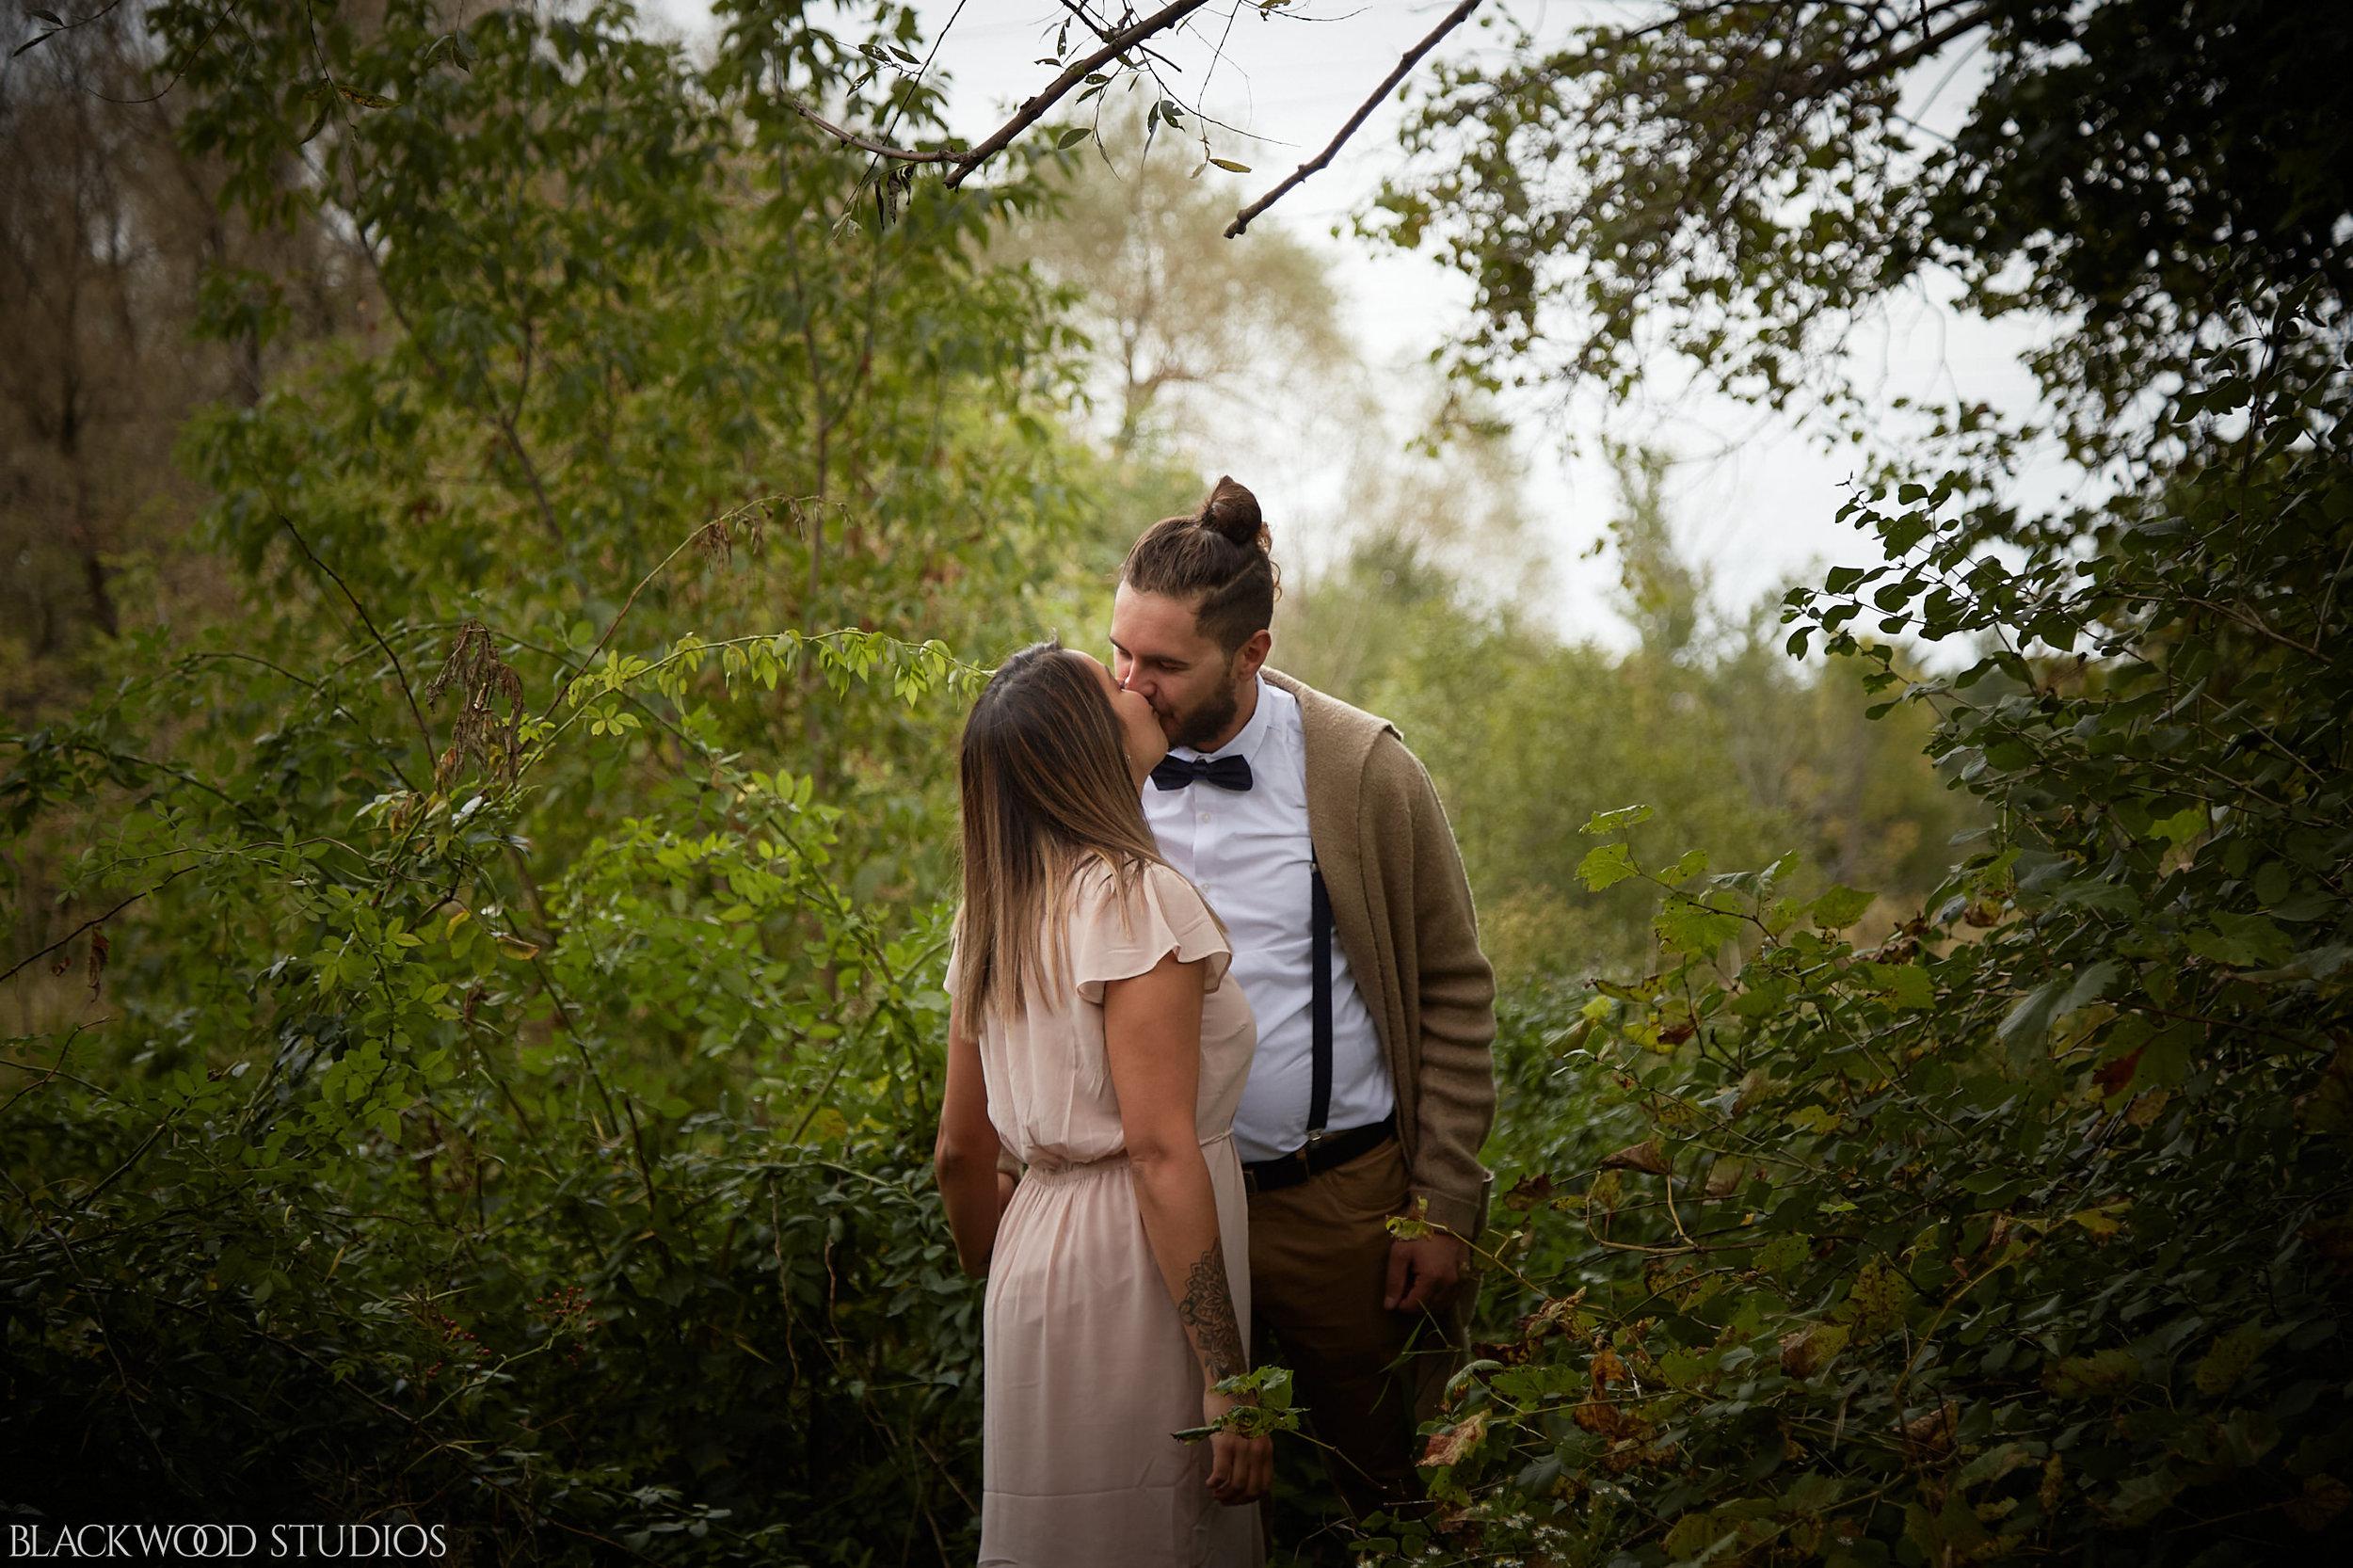 Blackwood-Studios-20180930-144452-Evan-Vanessa-Engagement-Photography-Toronto-Ontario-city-park.jpg